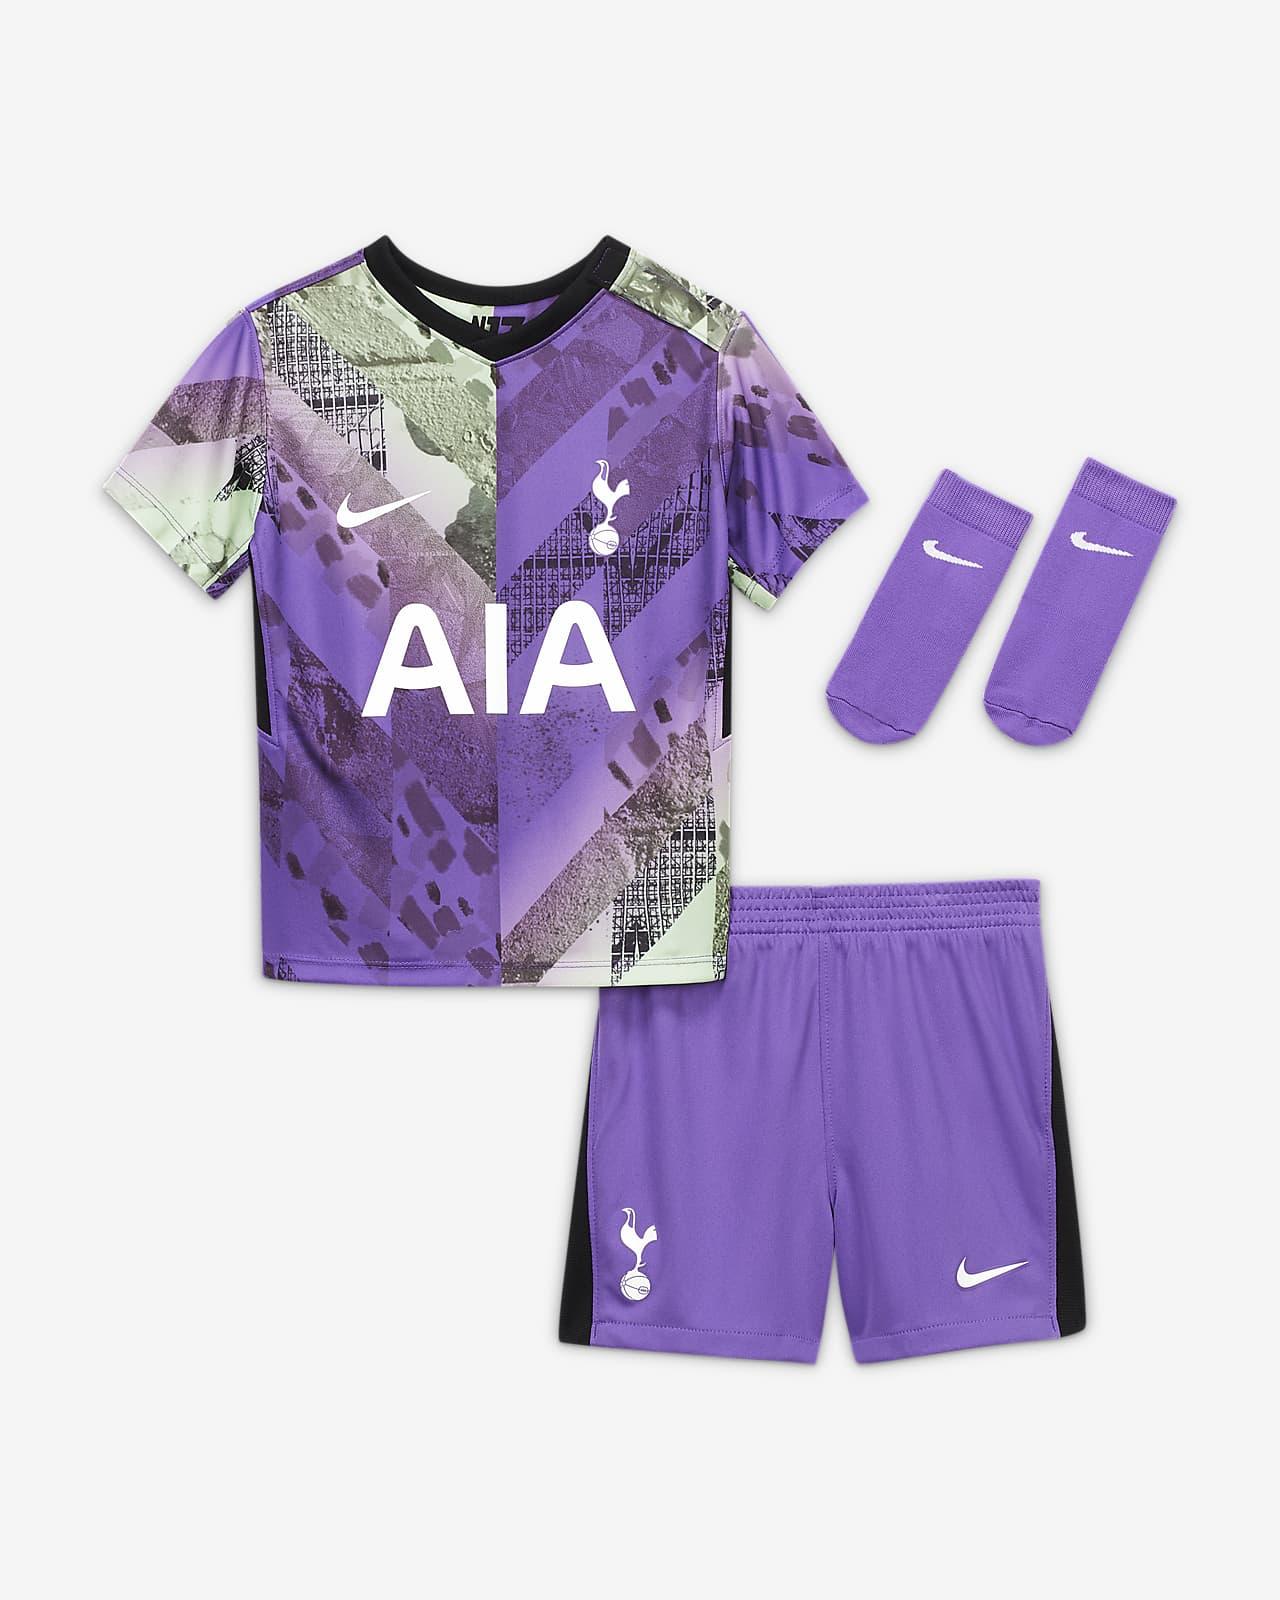 Divisa Tottenham Hotspur 2021/22 per neonati/bimbi piccoli - Terza